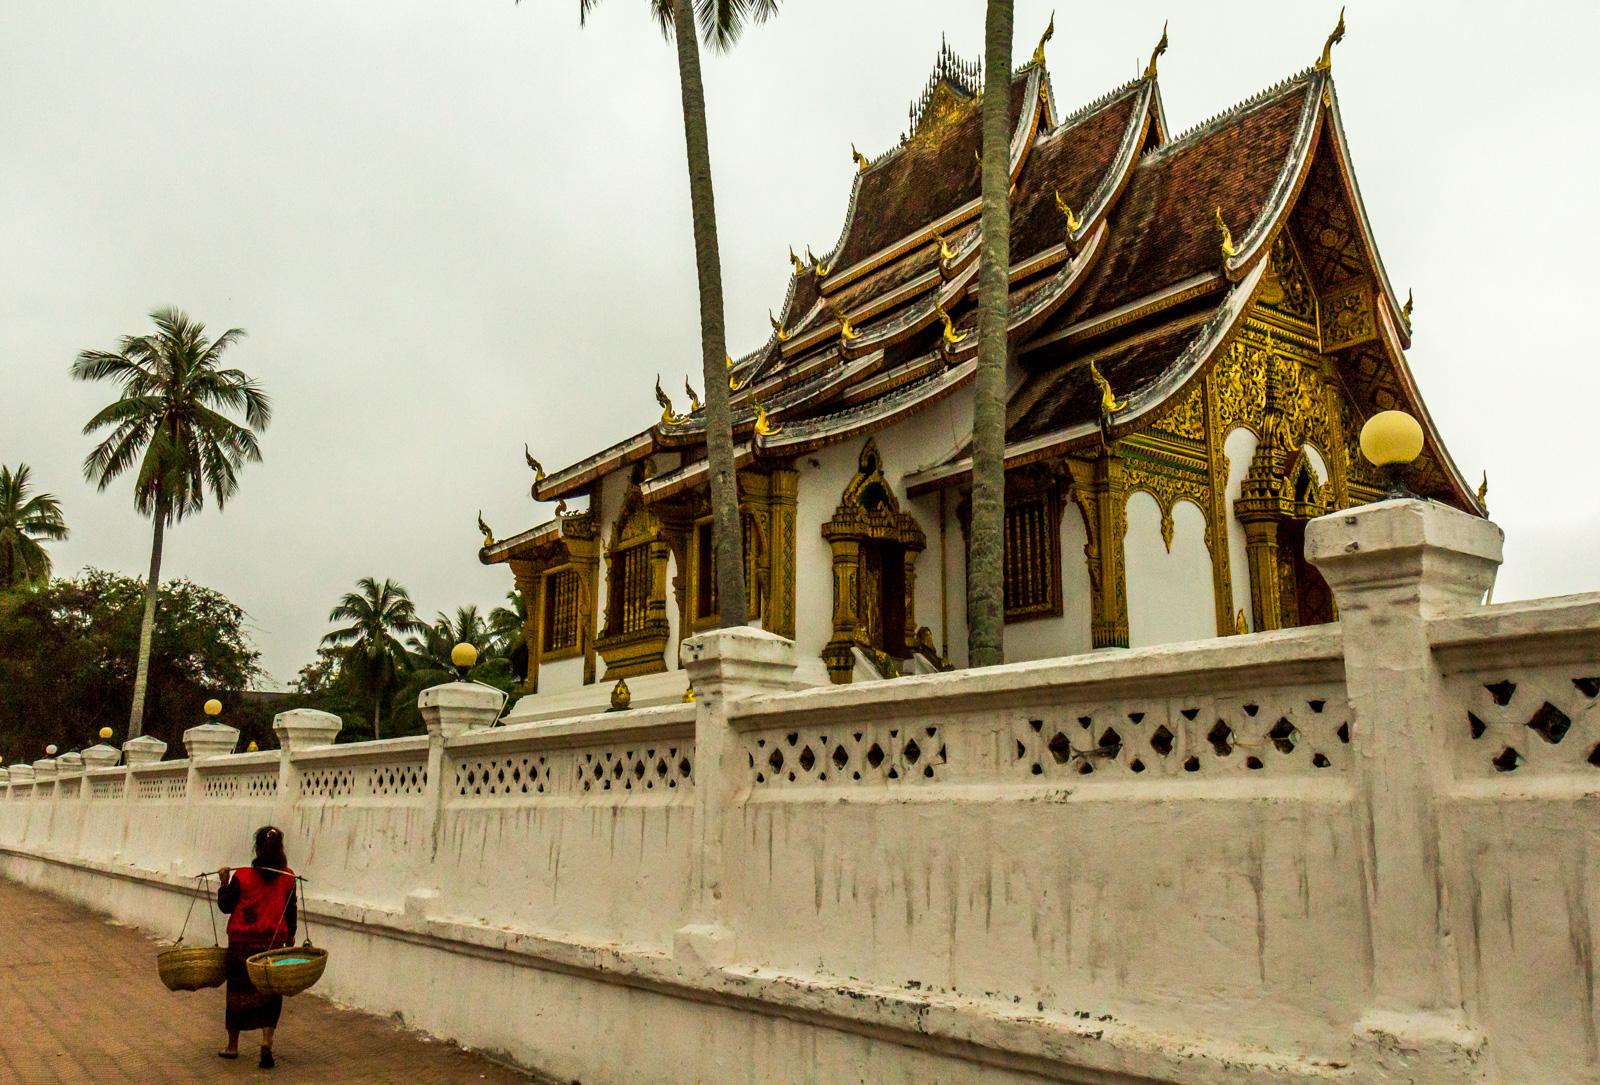 A vendor passes the palace.